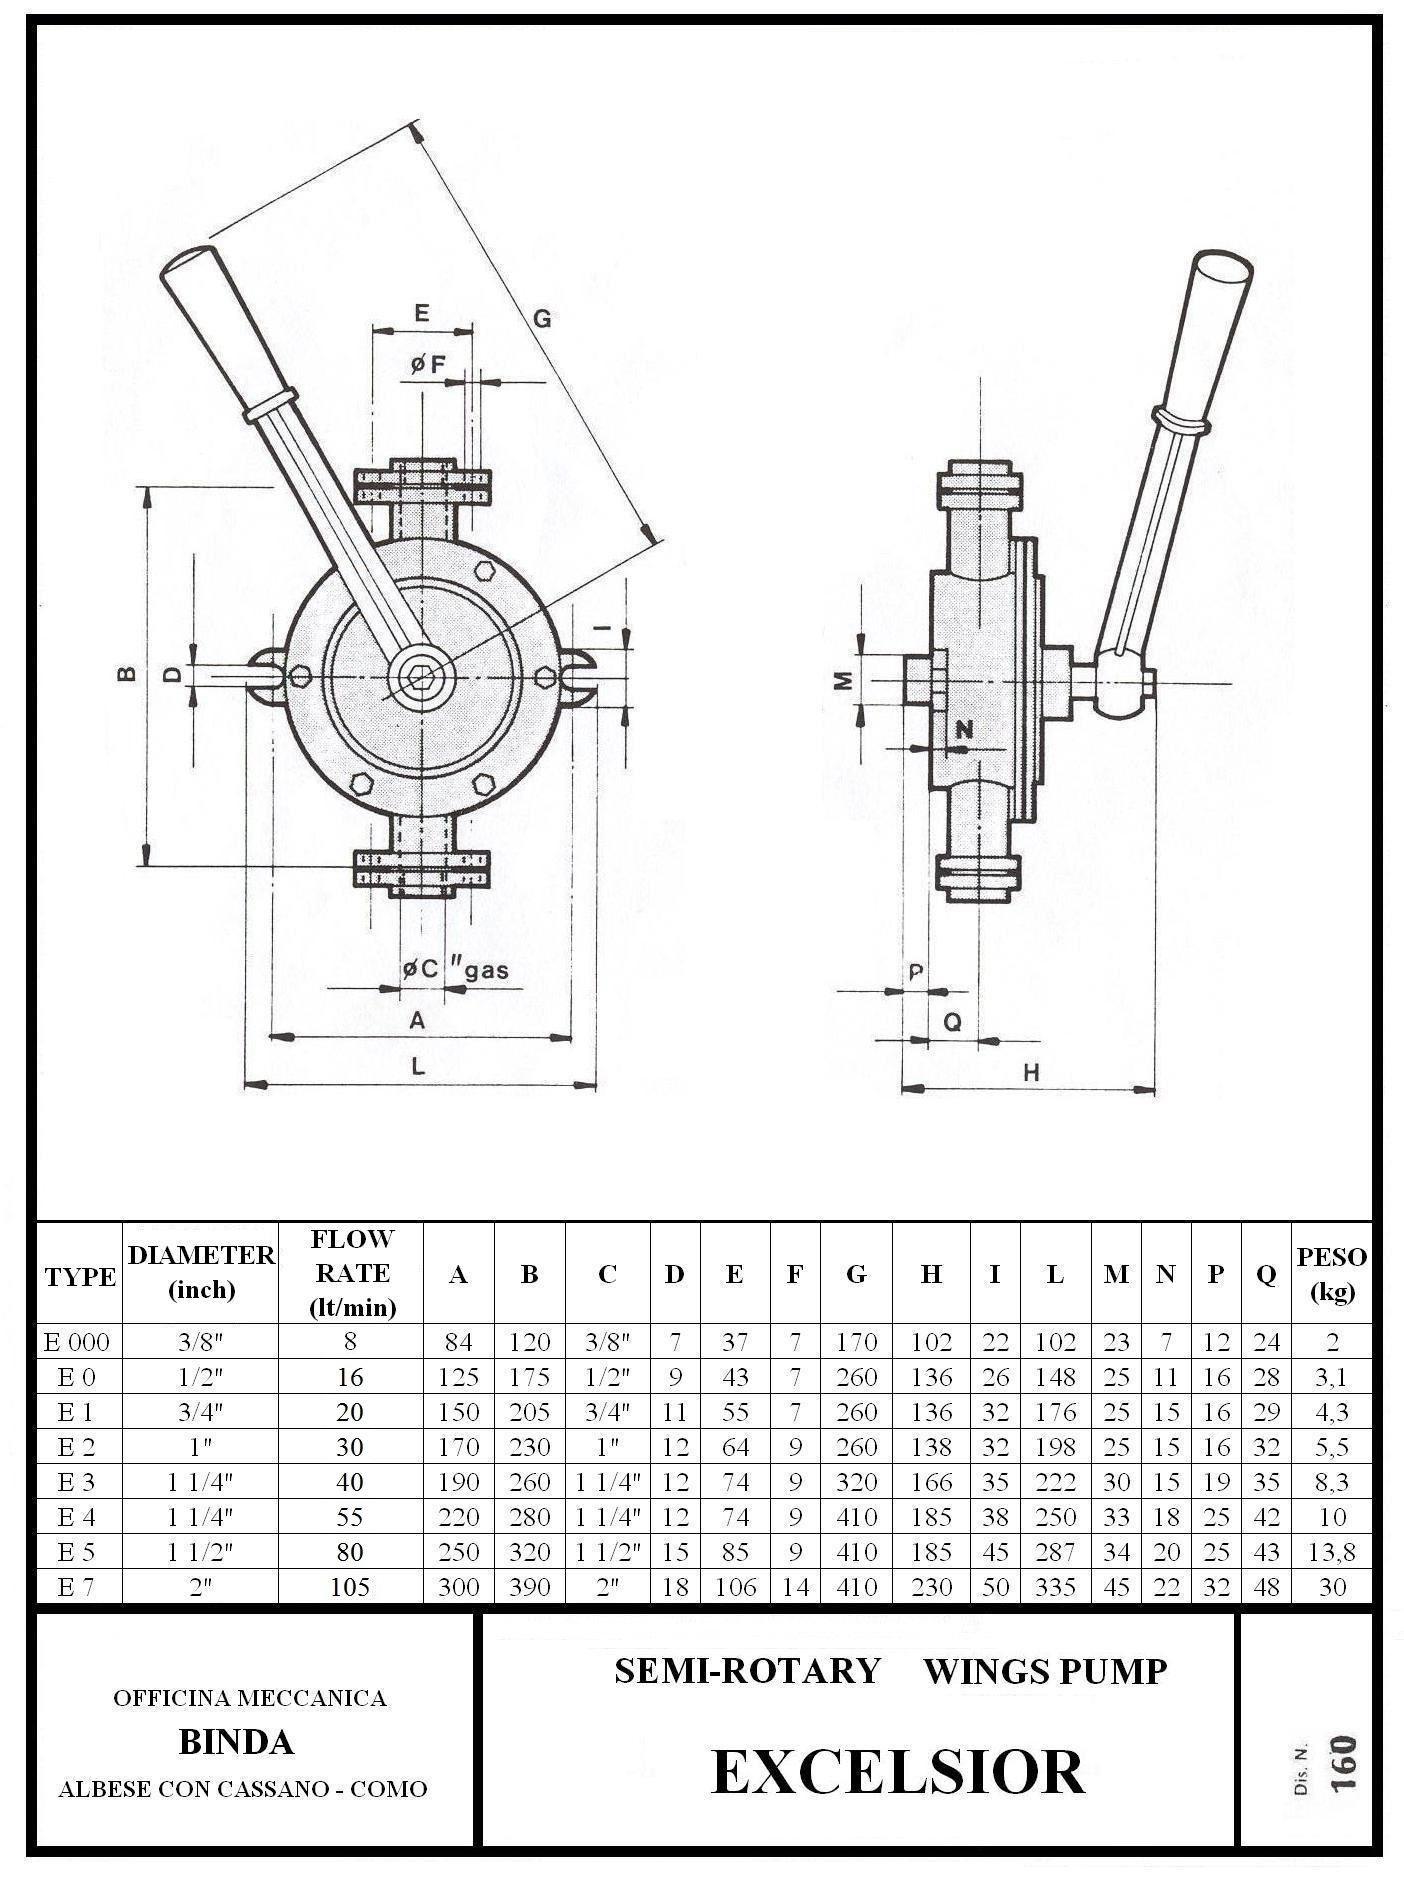 Binda Excelsior G Semi Rotary Hand Pump Amp Manual Pump